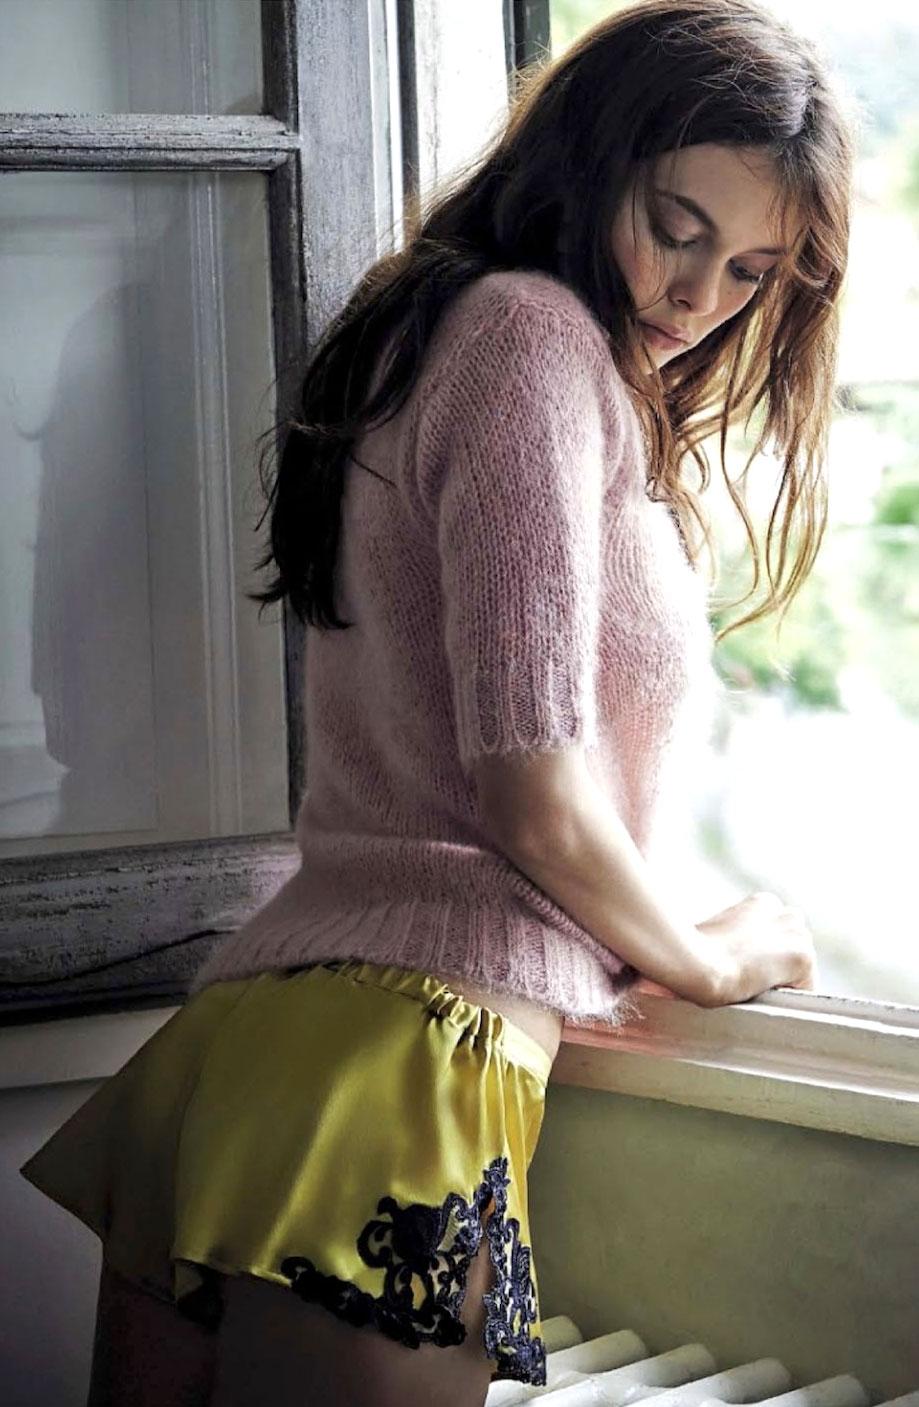 Sogni e risvegli, Vanity Fair Style August 2014 (photography: Pamela Hanson, styling: Sciascia Gambaccini, model: Elizaveta Adamenko